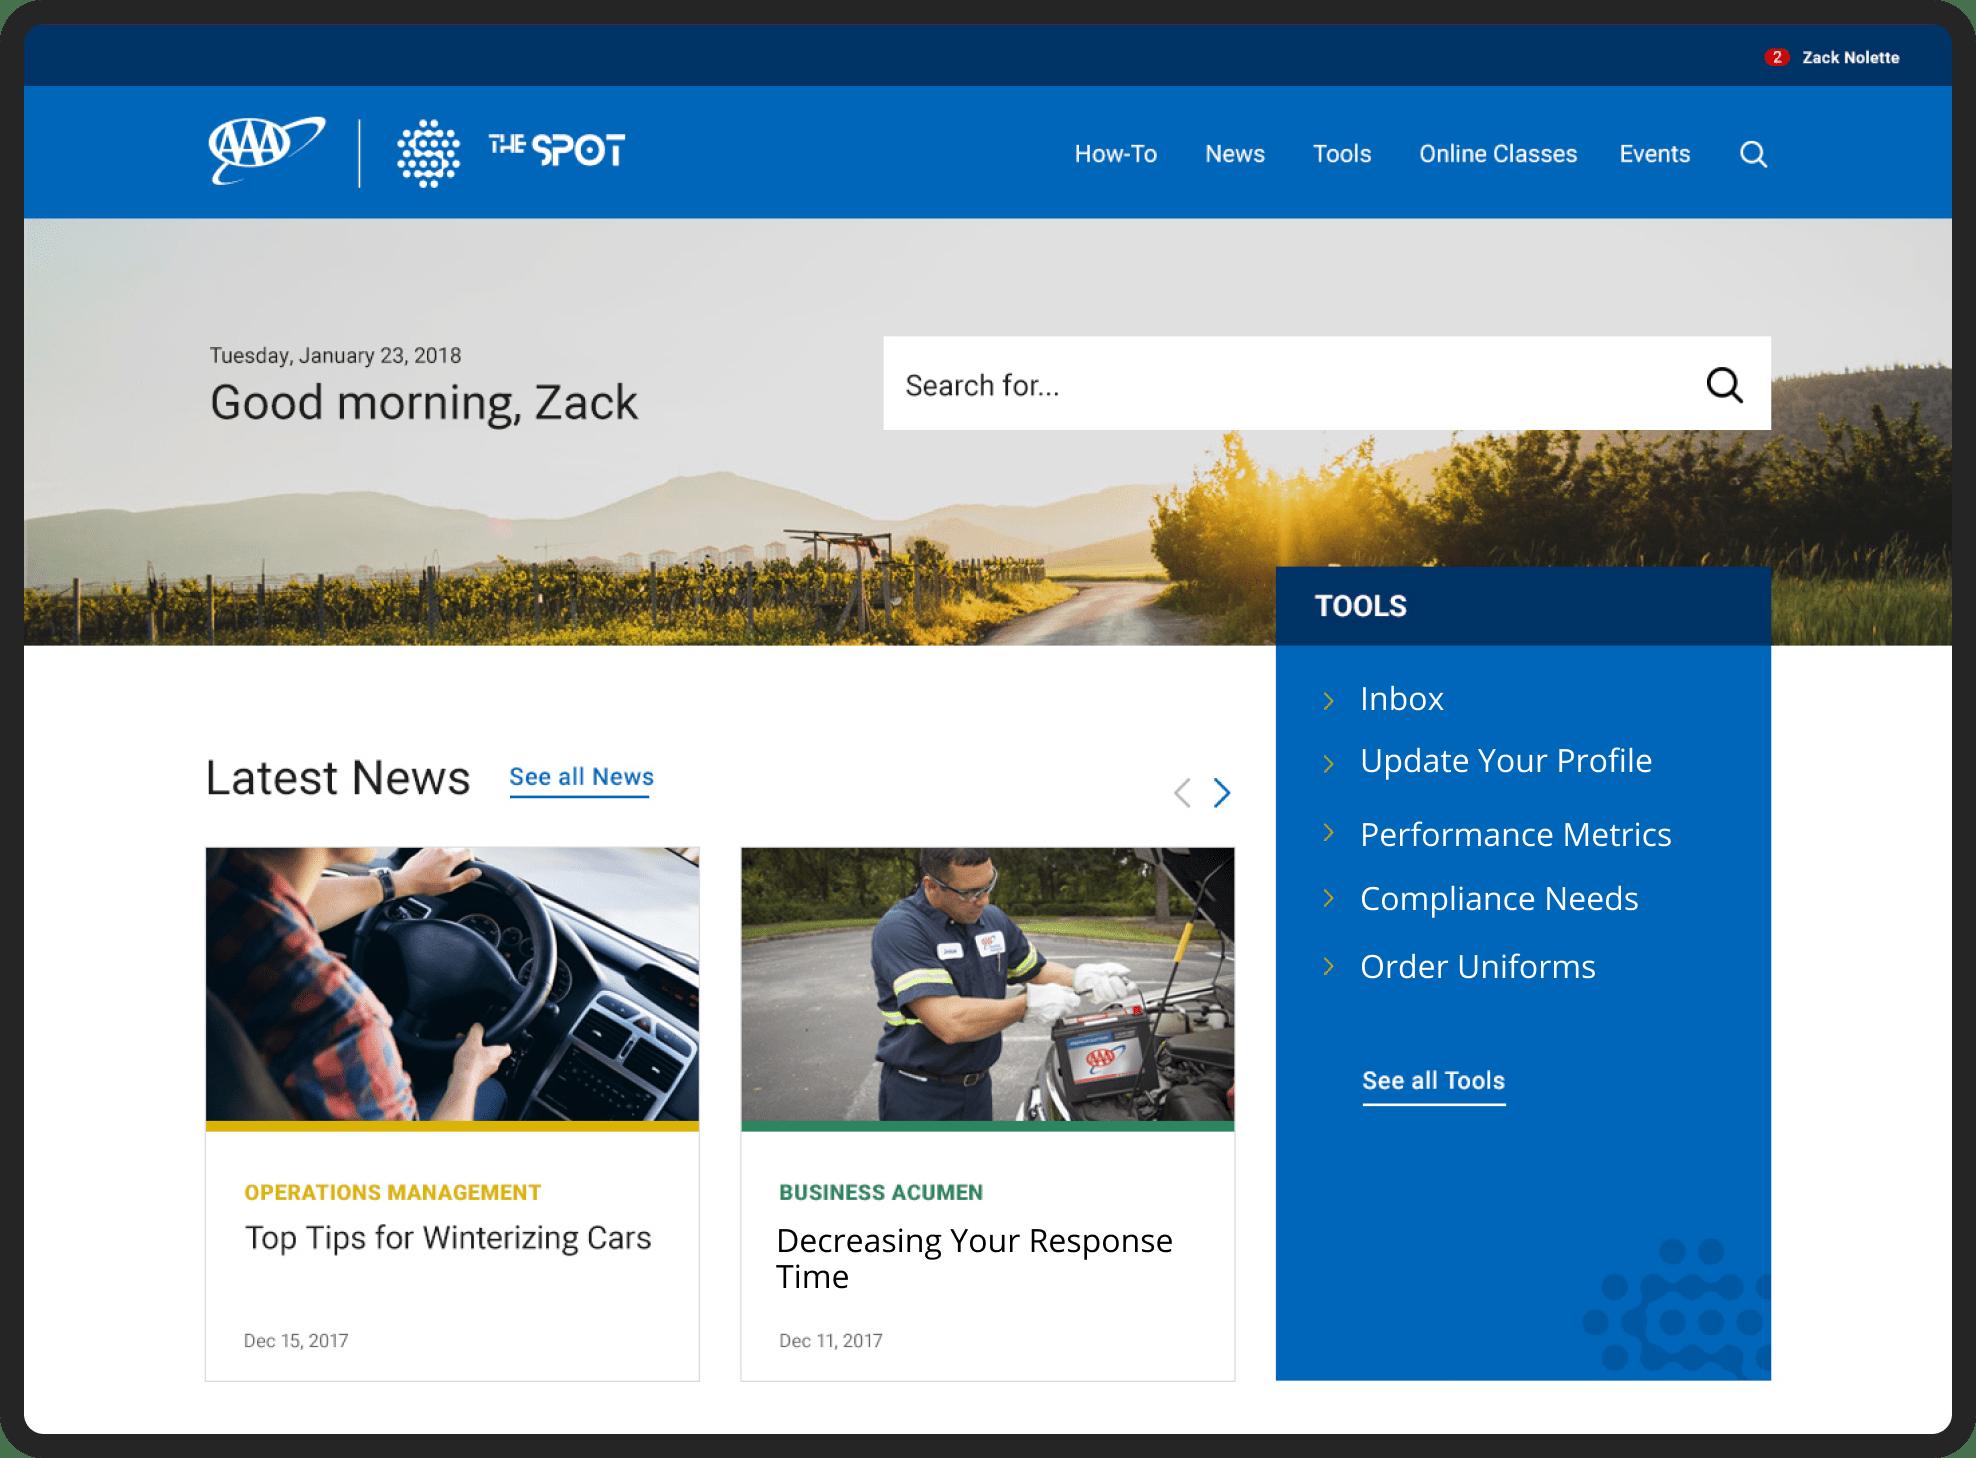 AAA The Spot homepage